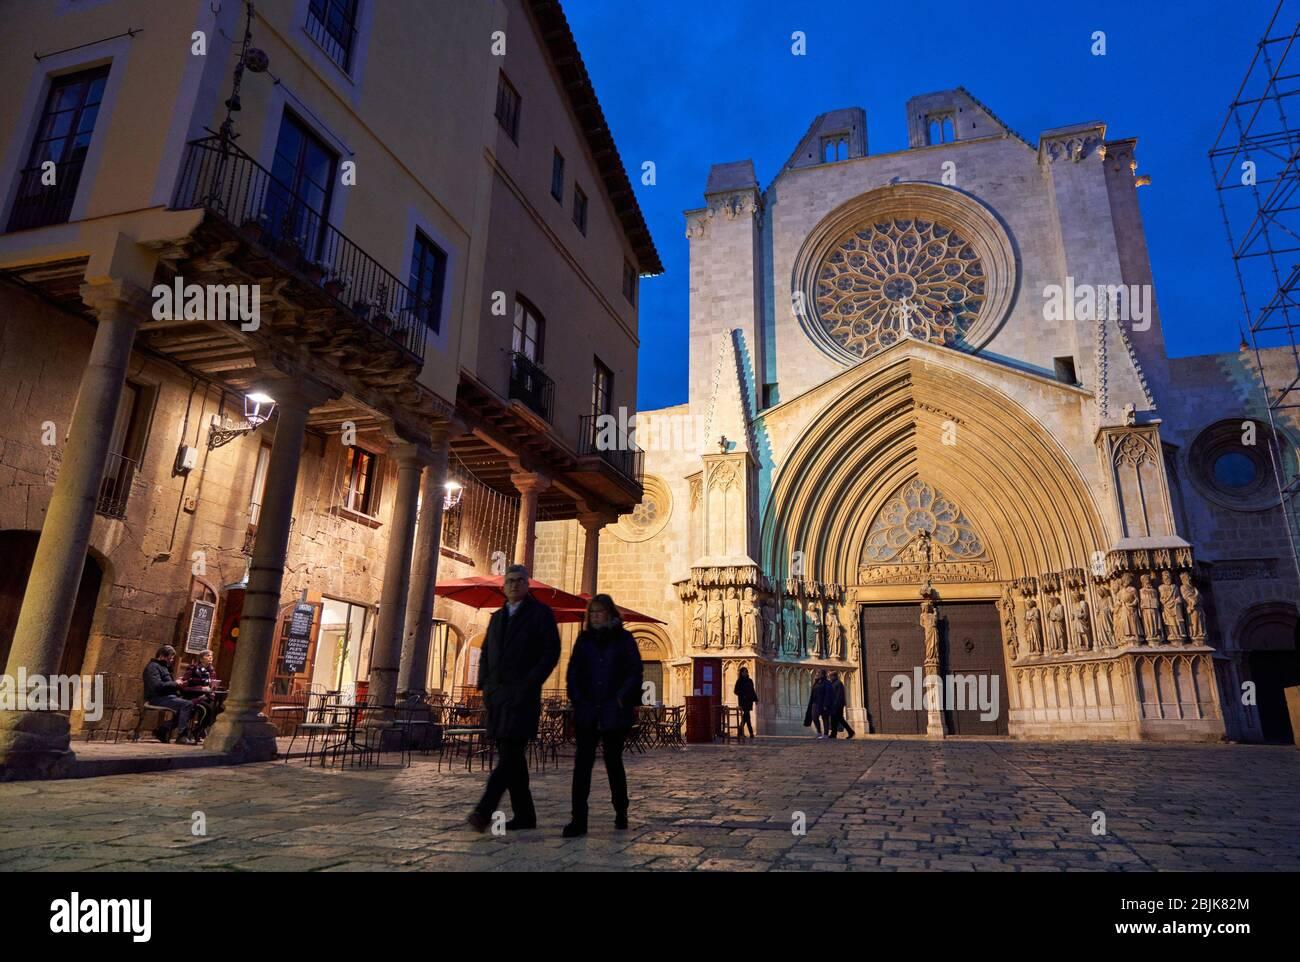 Cathedral, Pla de La Seu, Tarragona City, Catalonia, Spain, Europe Stock Photo